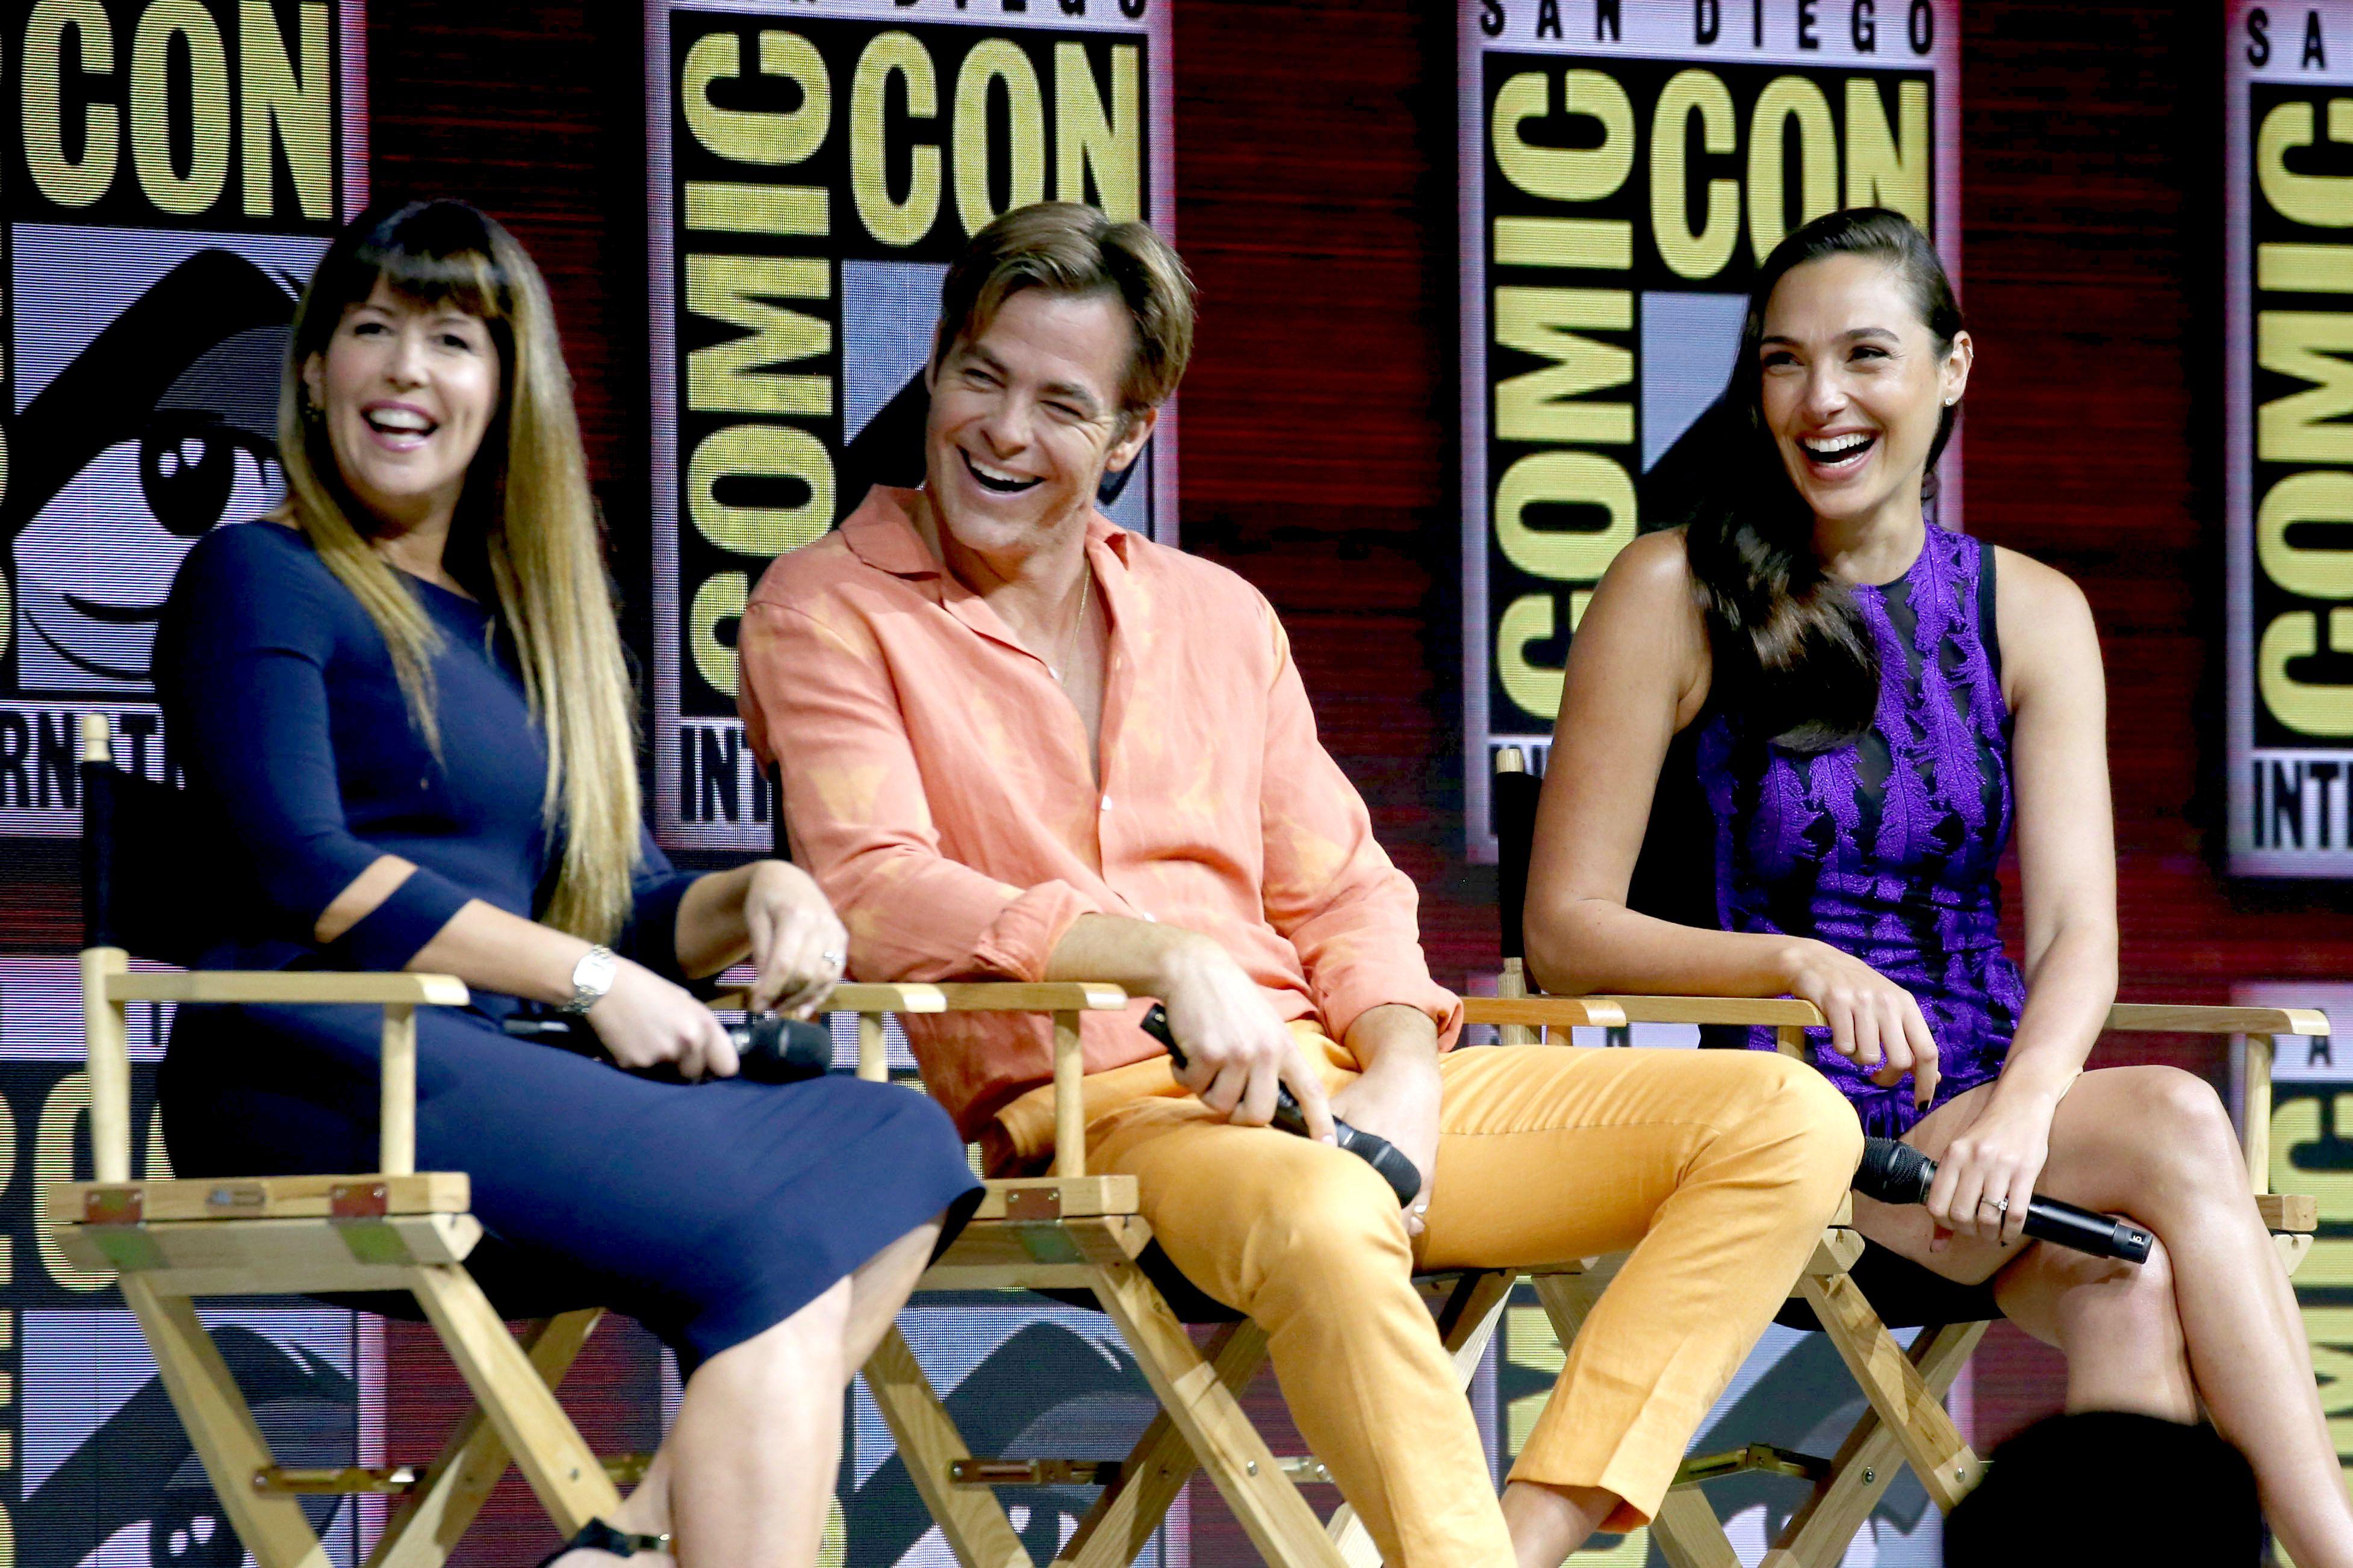 Chris Pine and Gal Gadot'Wonder Woman' film panel, Comic-Con International, San Diego, USA - 21 Jul 2018